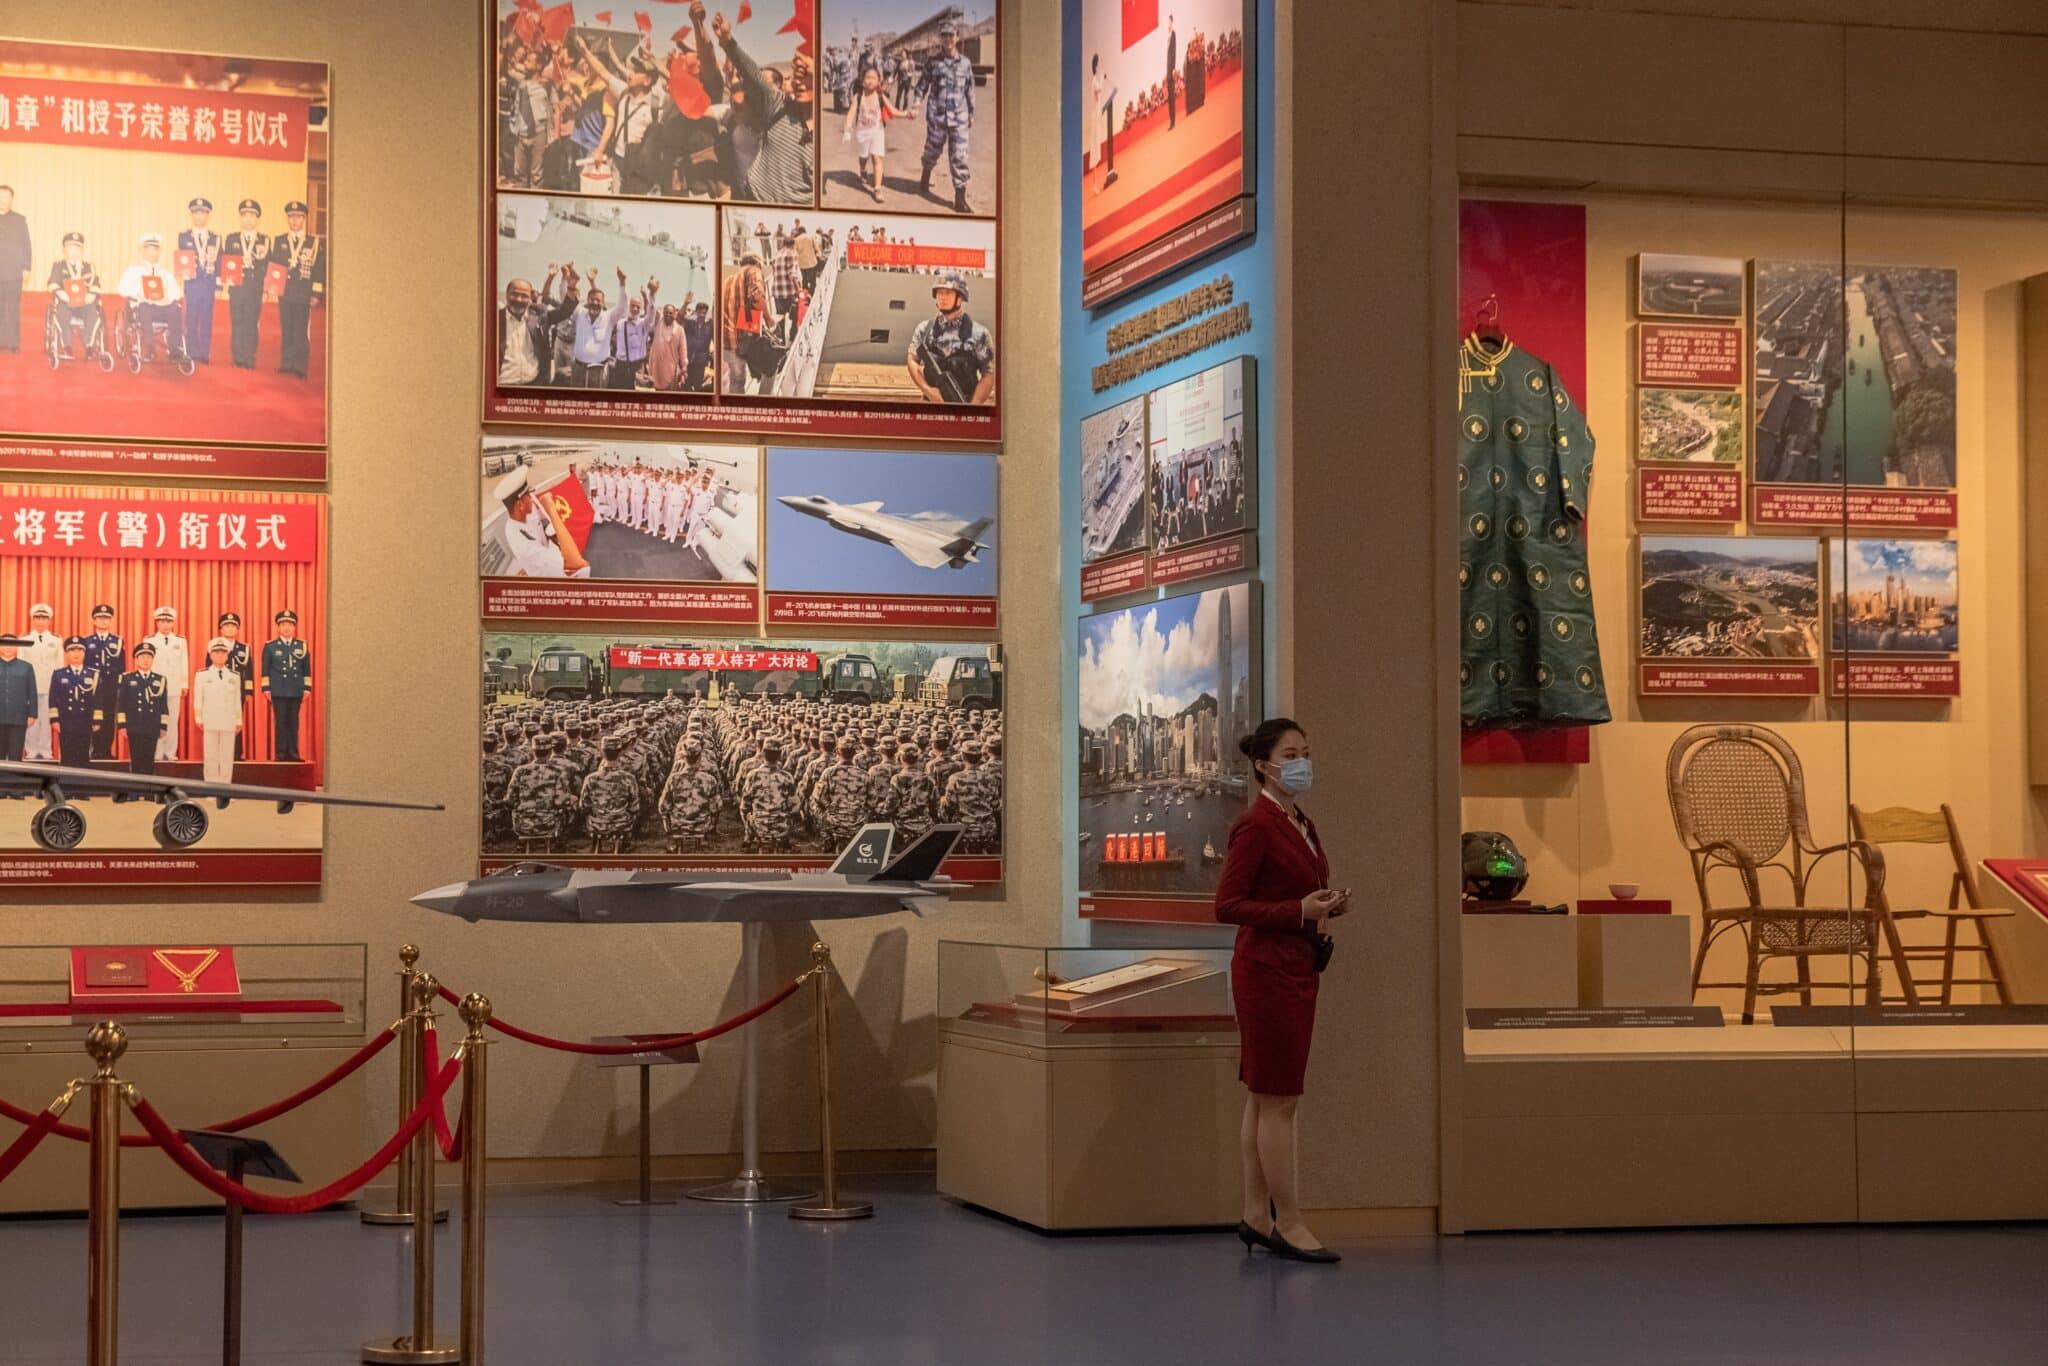 Guía en elMuseo del Partido Comunista de China en Pekín